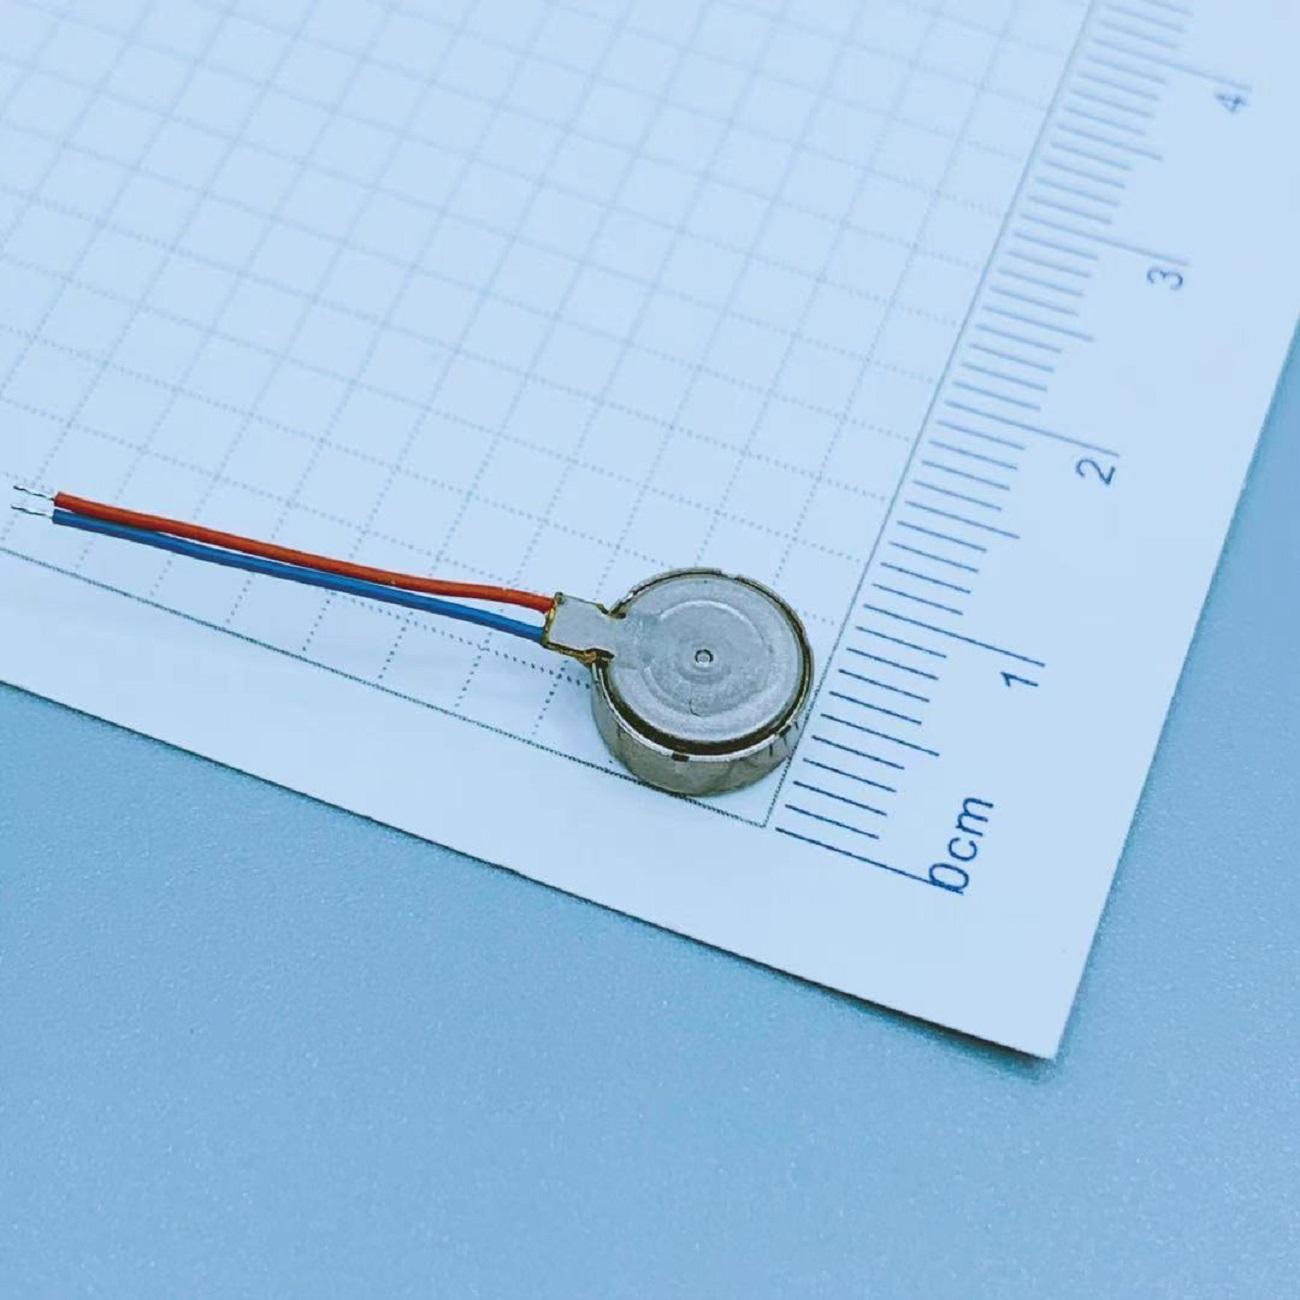 Diameter 8mm*3.4mm Small Vibrating Motors | Round Vibrator | LEADER